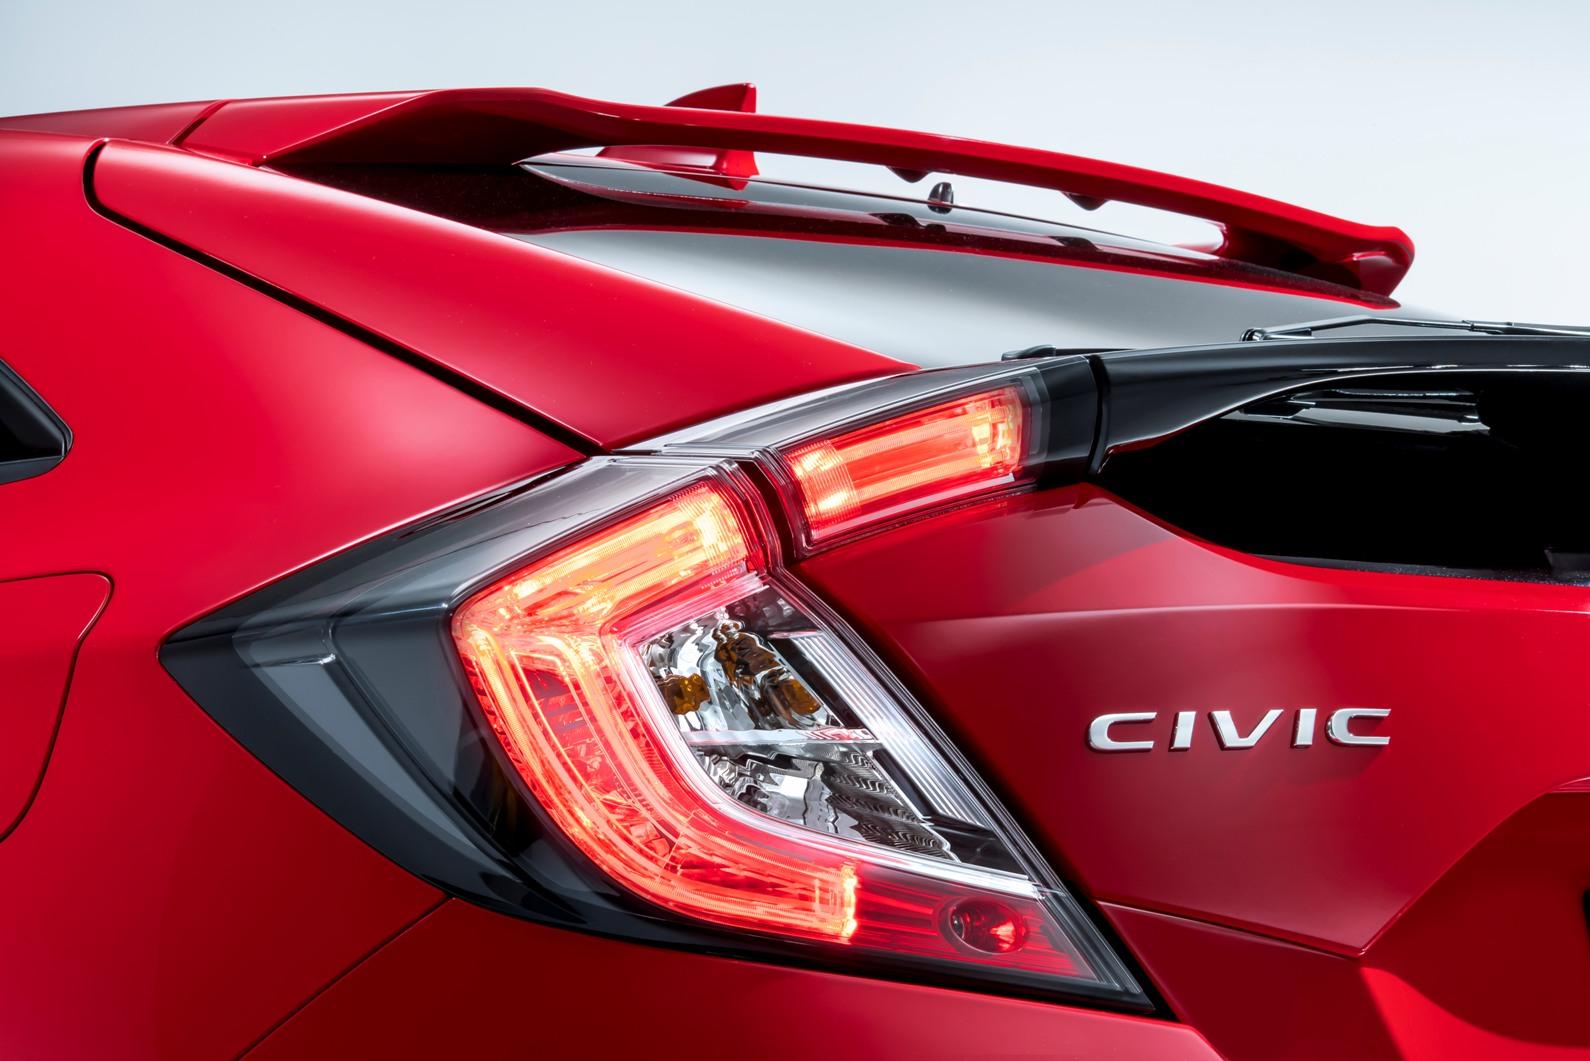 Noua generatie Honda Civic debuteaza la Salonul Auto de la Paris